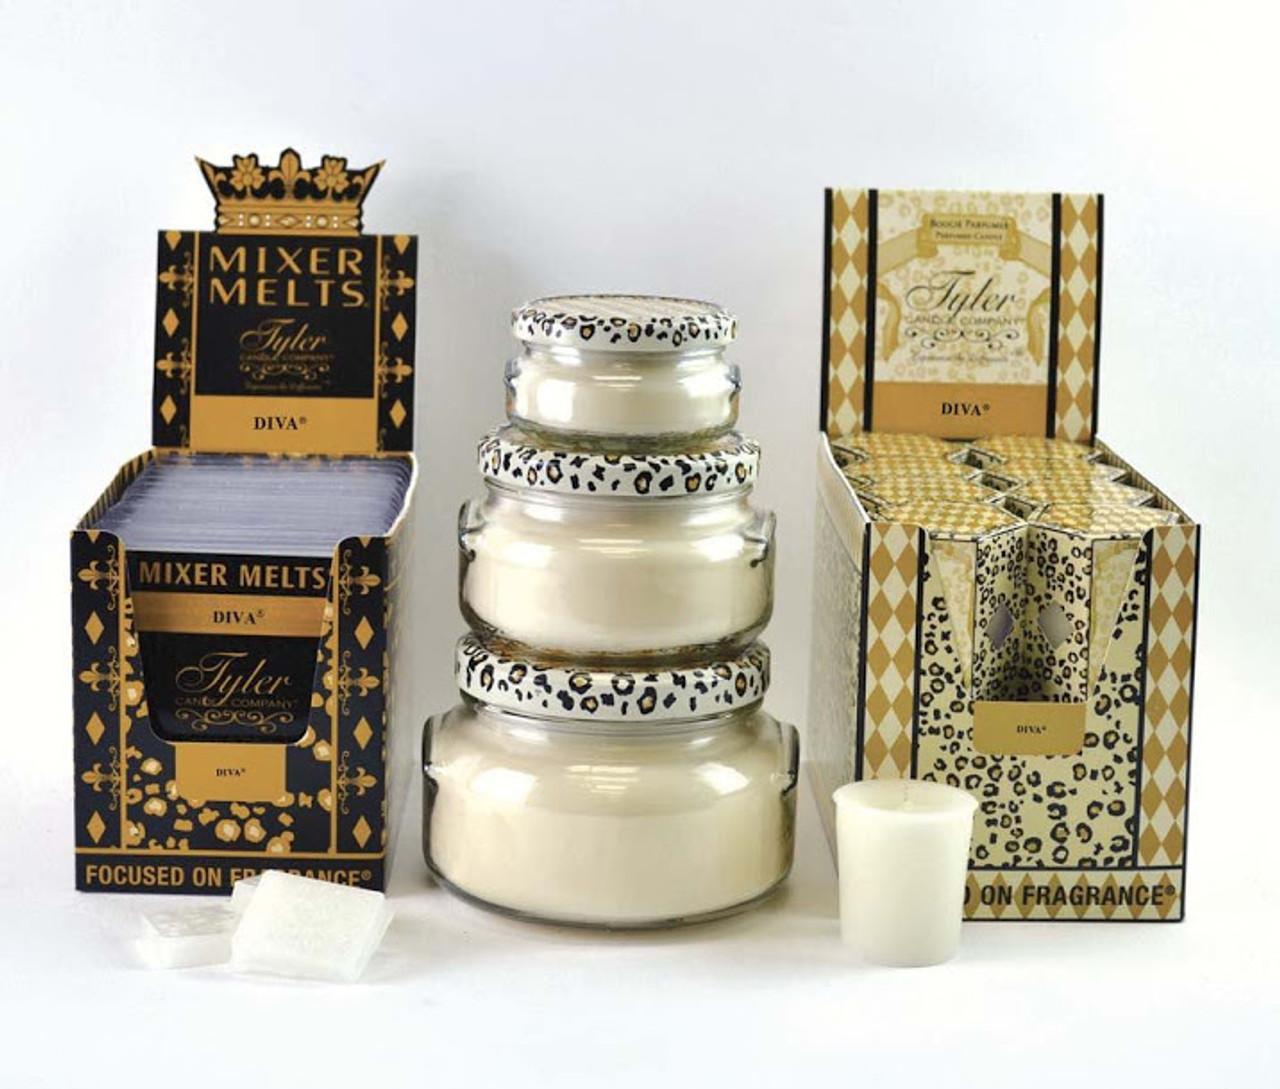 3.4 oz. DIVA® Tyler Candle Company